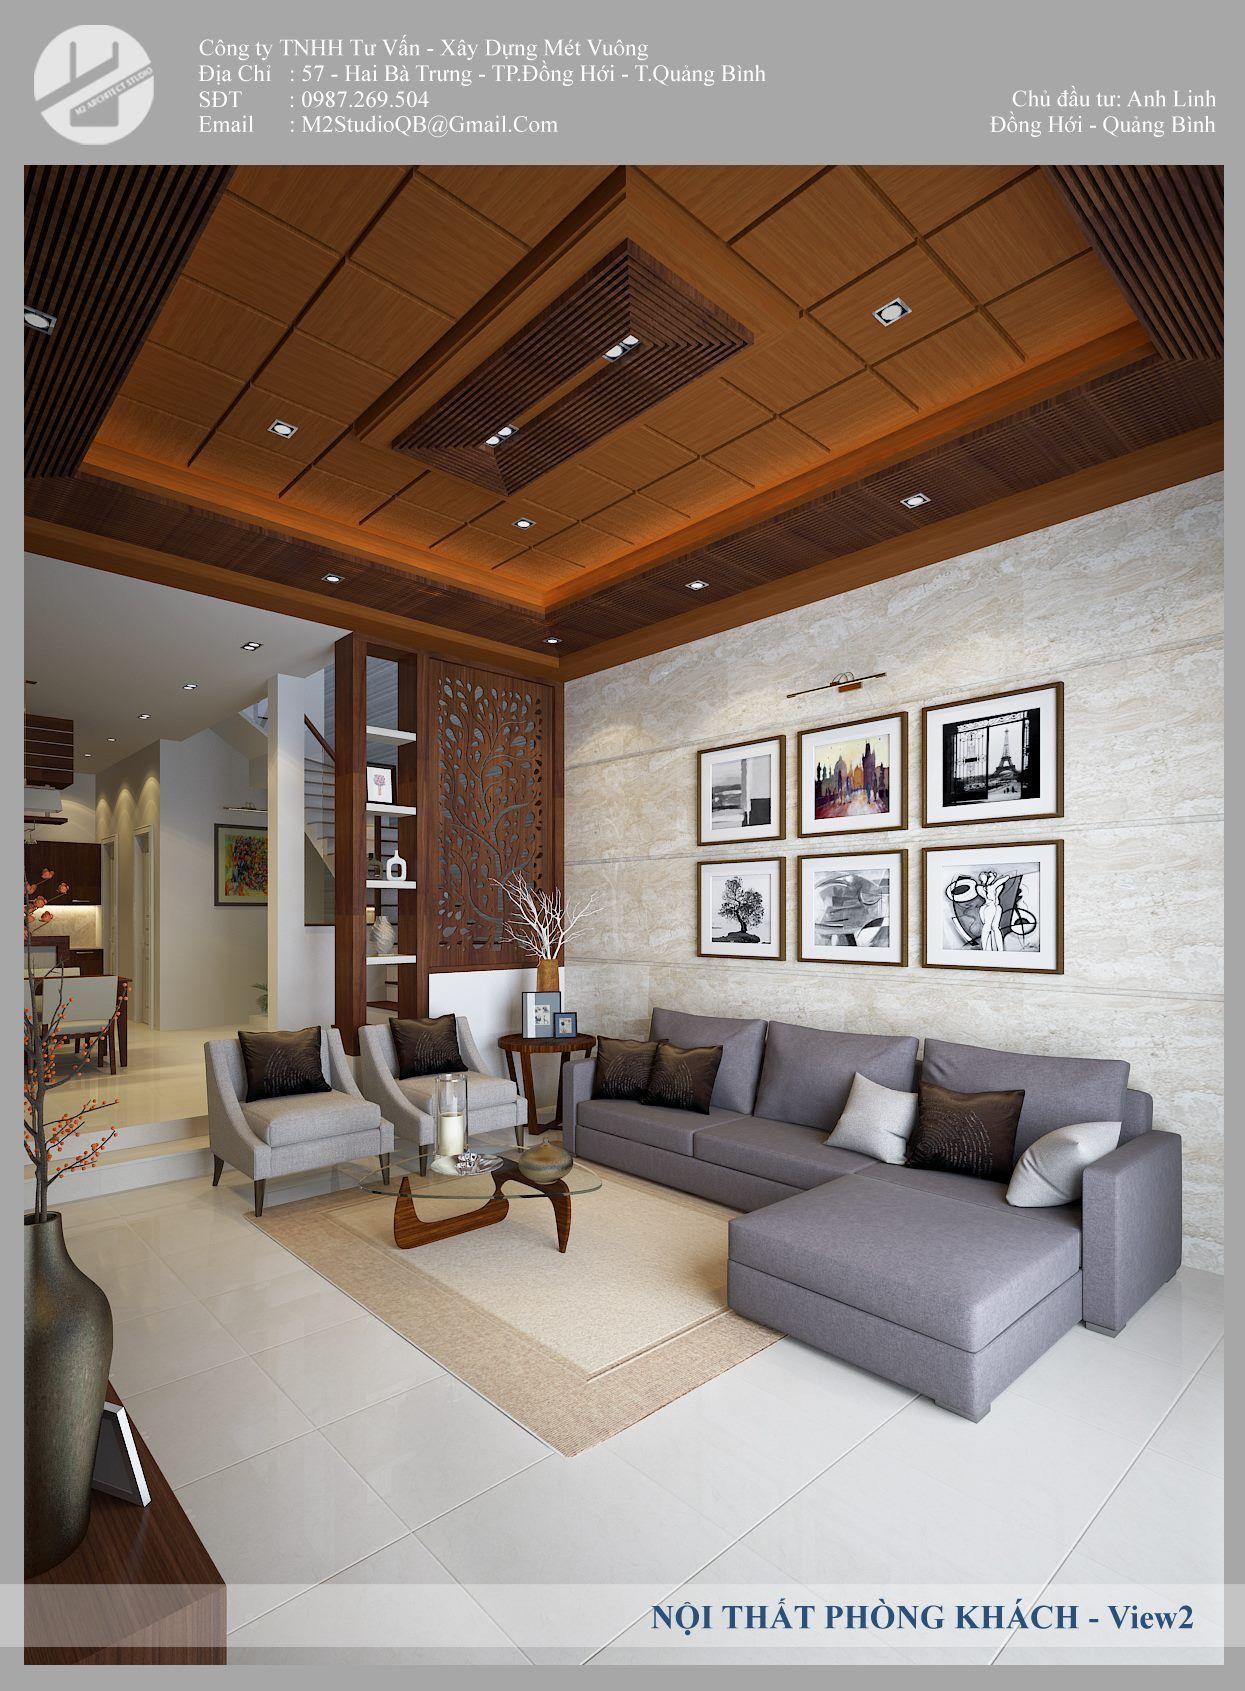 Idea By Dang Ngoc Vien On Met Vuong Architect Ceiling Design